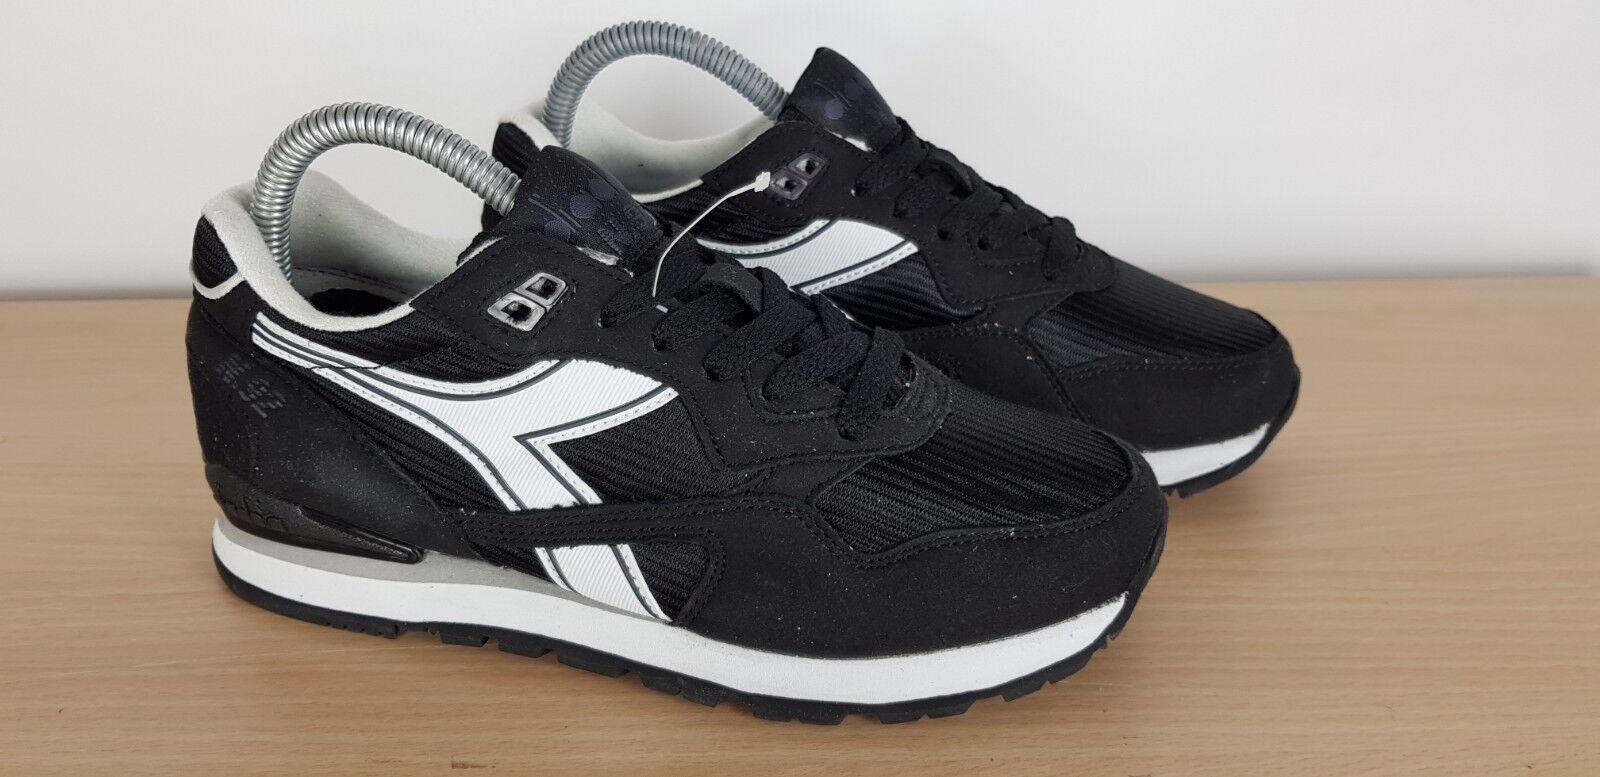 Diadora Unisex para Hombre Damas Niños Niñas Negro N92 Retro Zapatillas Deportivas UK 5